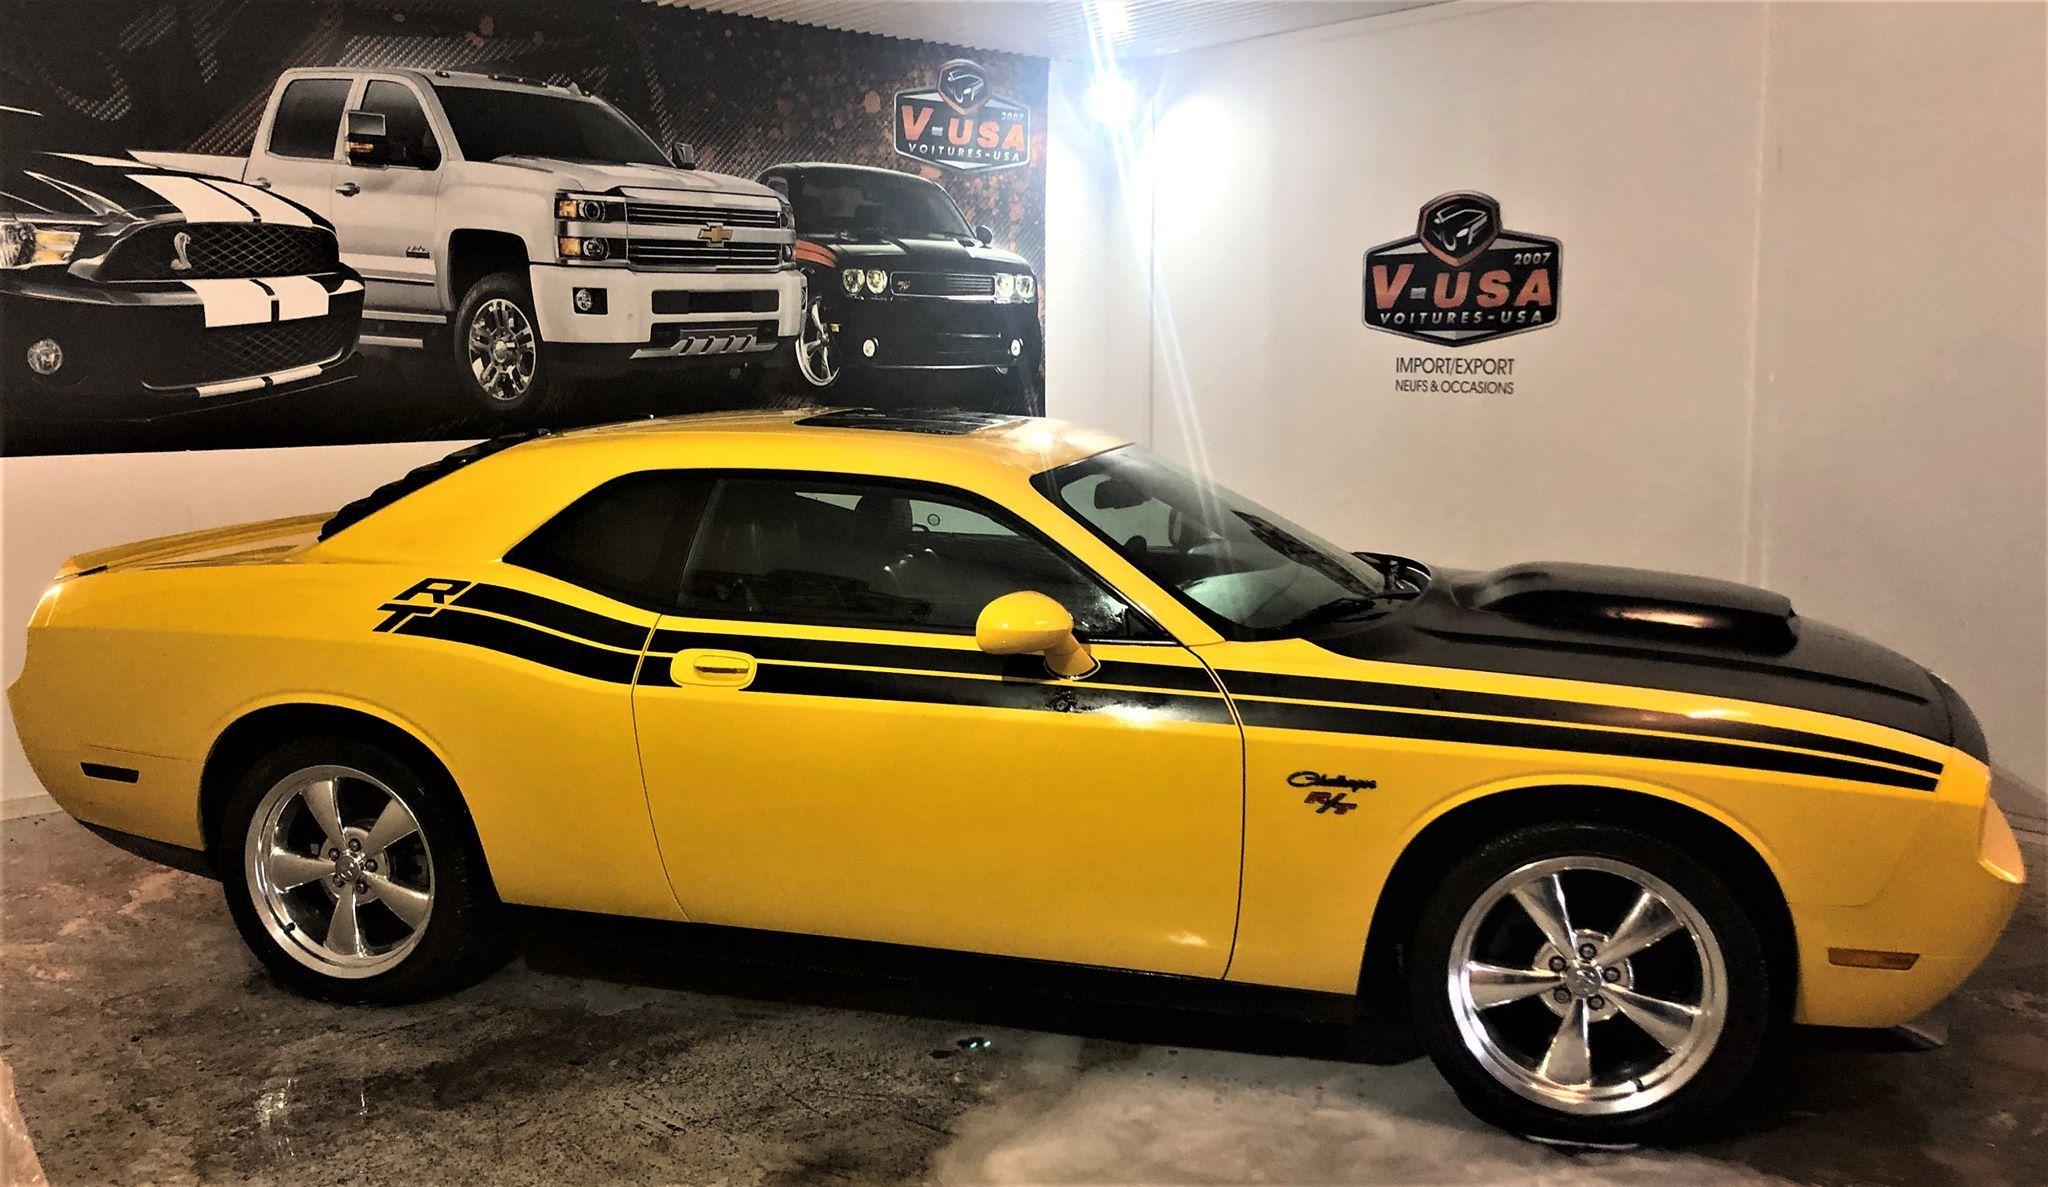 Heurty (Dodge Challenger RT 2010) 1582571311-76760105-612220062884109-1214603913651552256-n